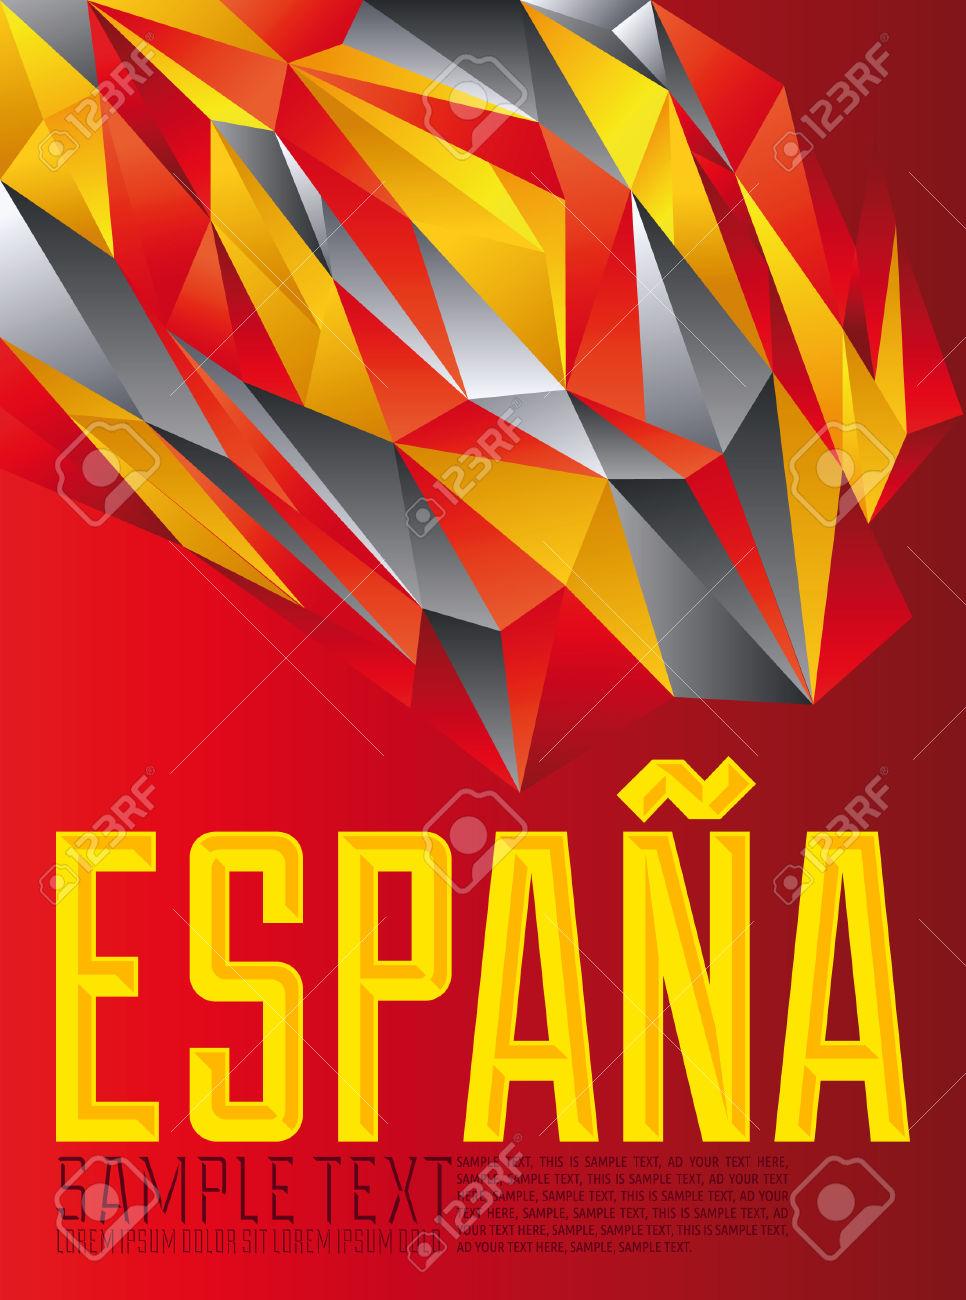 Free Hispanic Heritage Clipart.